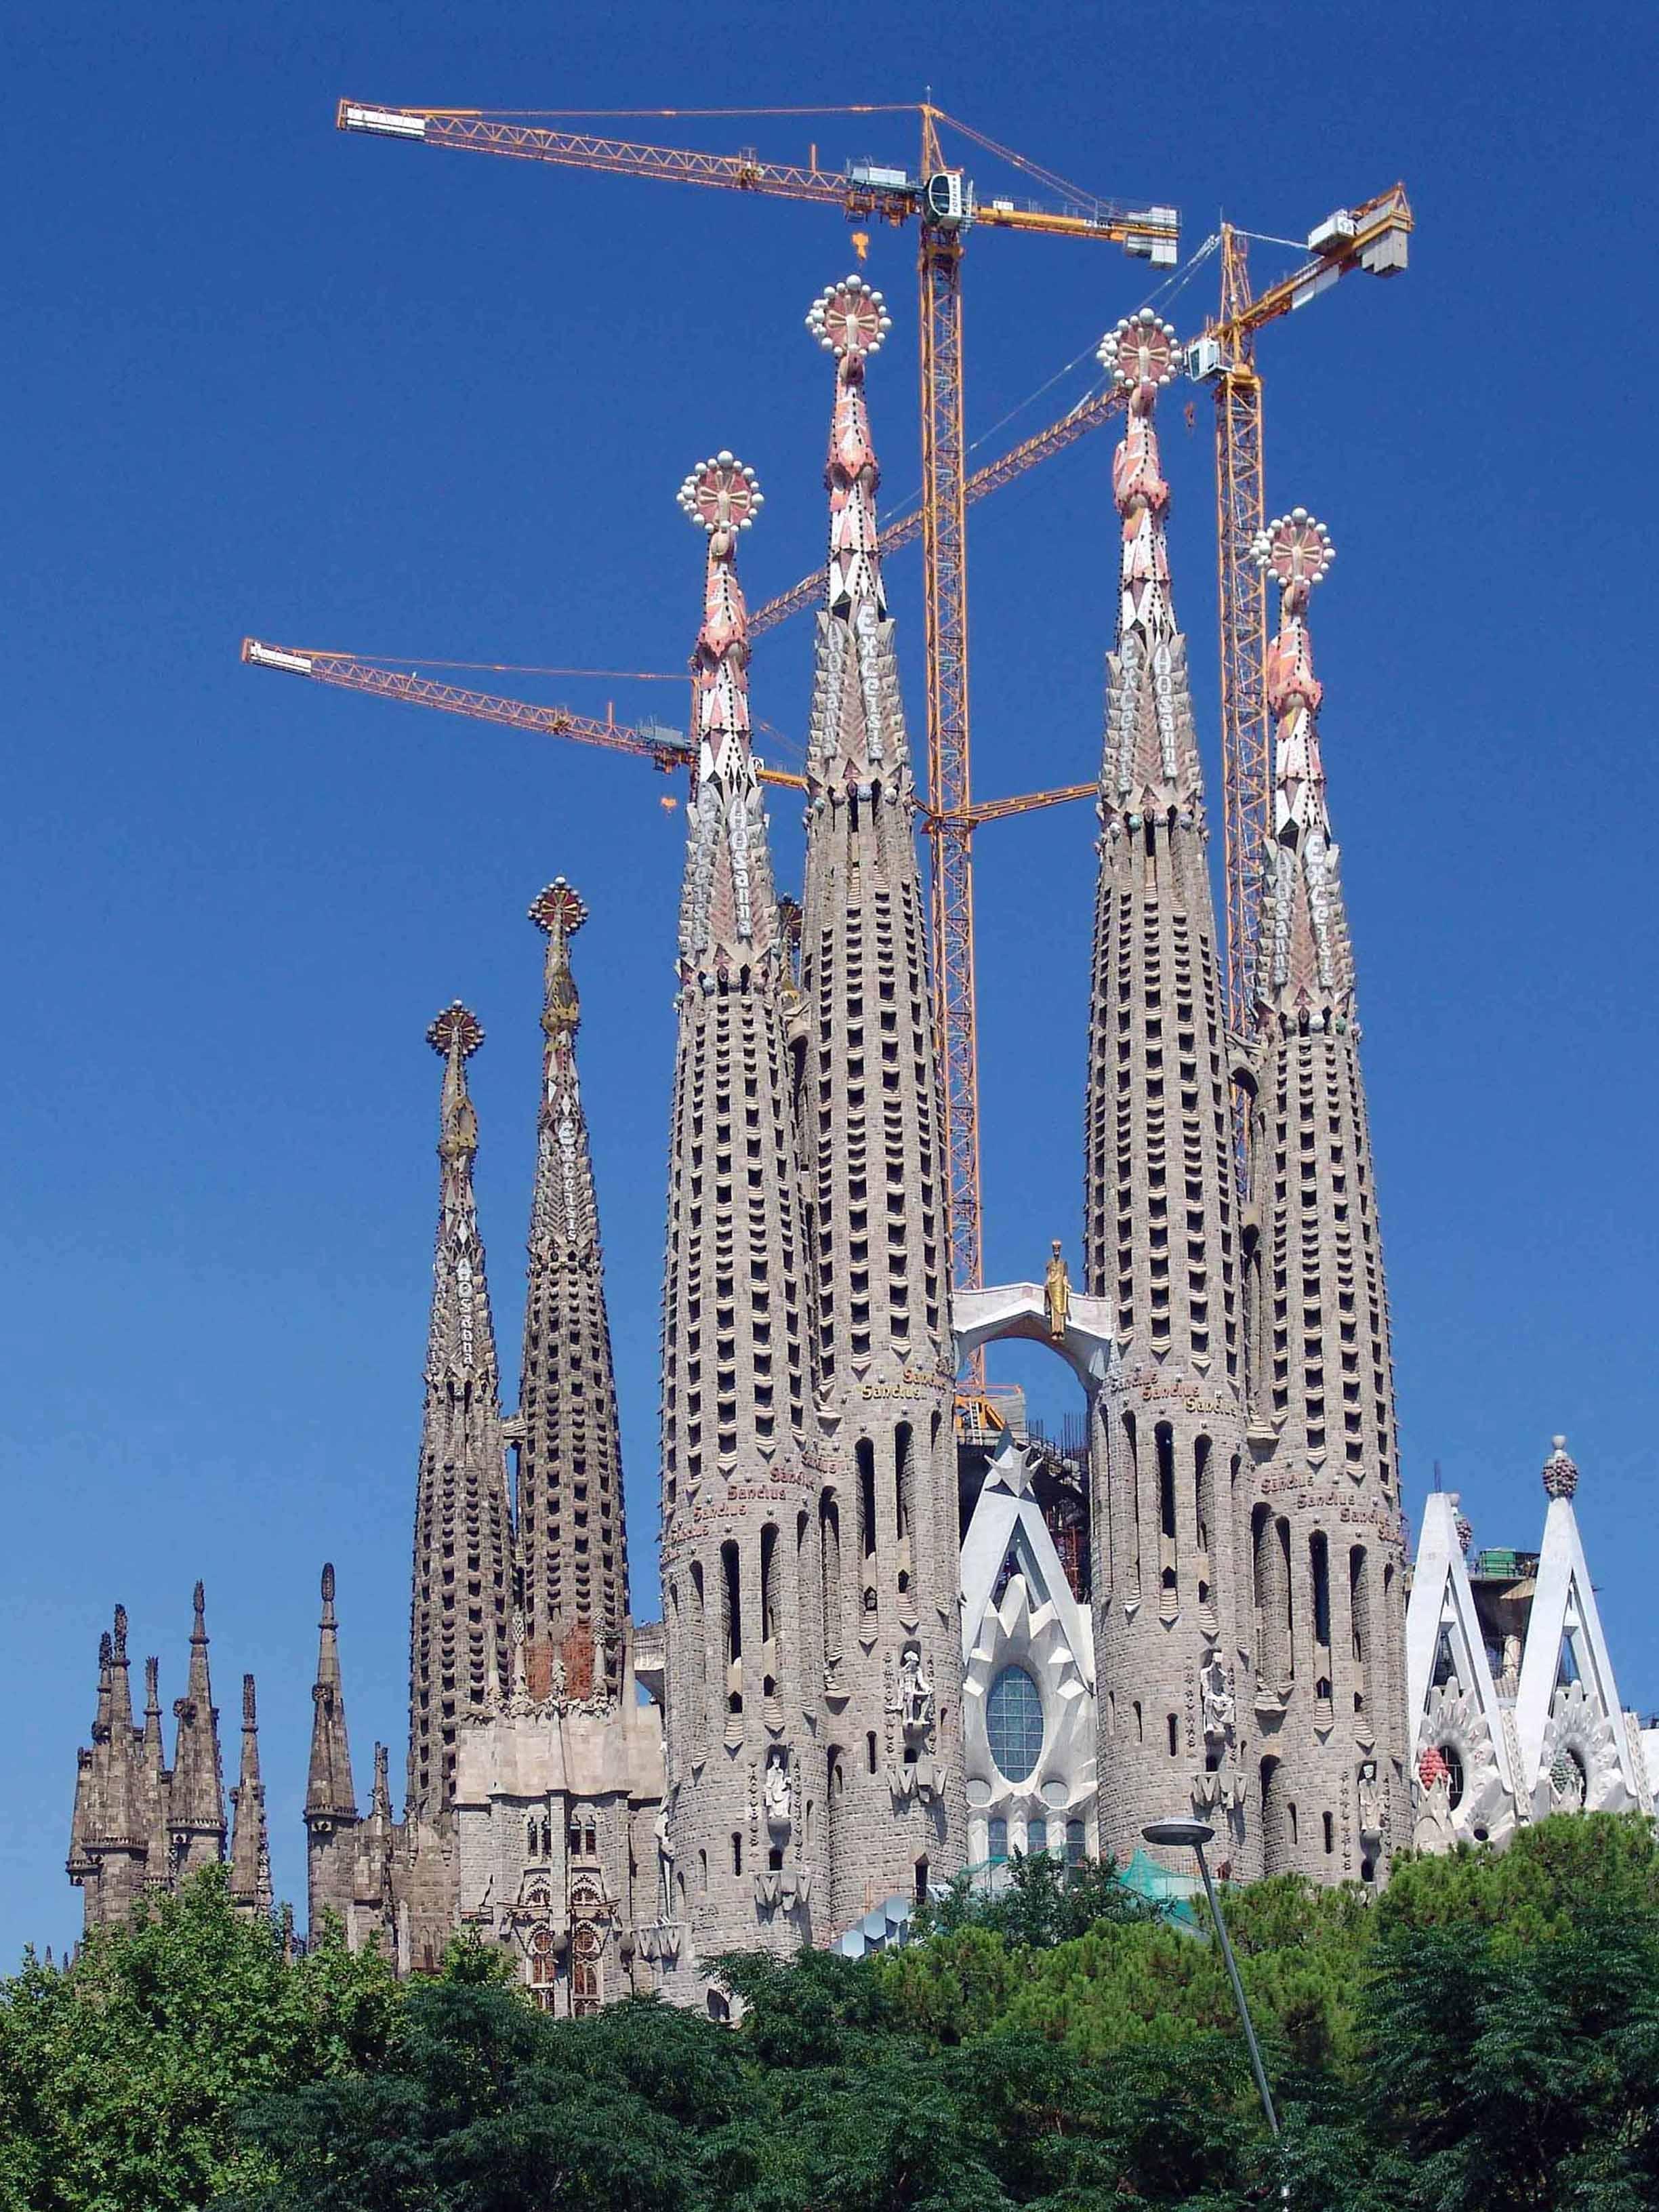 Free images building skyscraper tower landmark for Familia barcelona